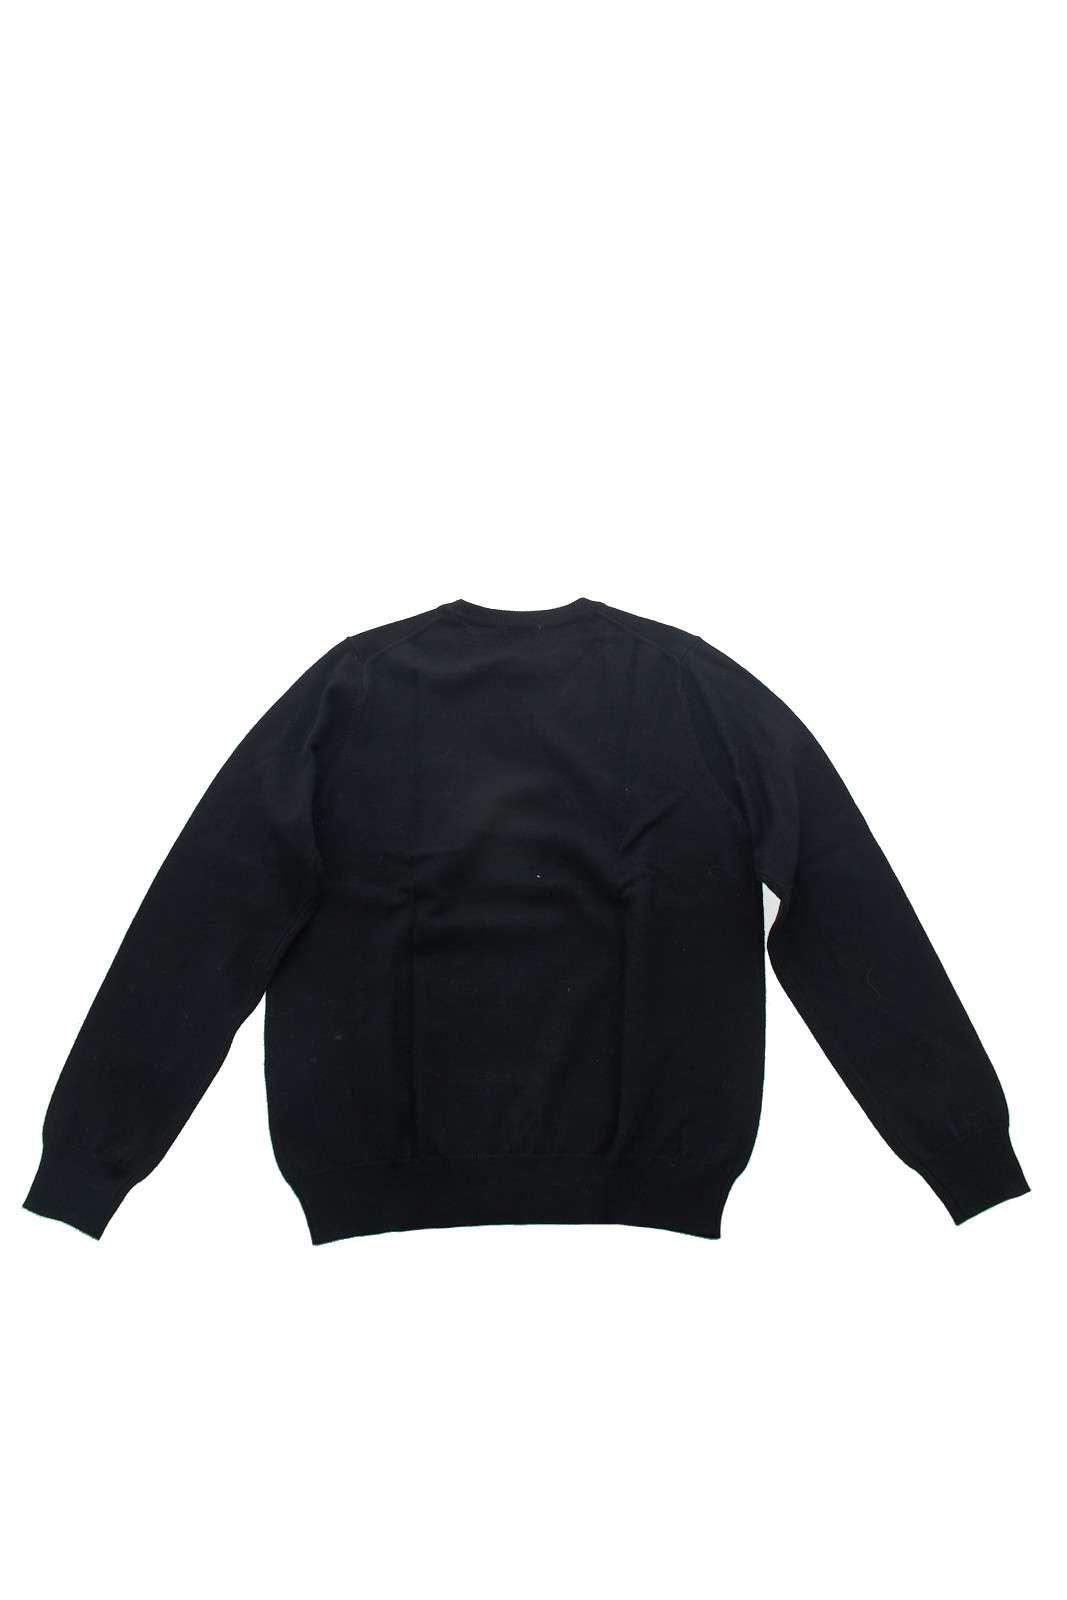 https://www.parmax.com/media/catalog/product/a/i/AI-outlet_parmax-maglia-bambino-sun%2068-26355-B.jpg